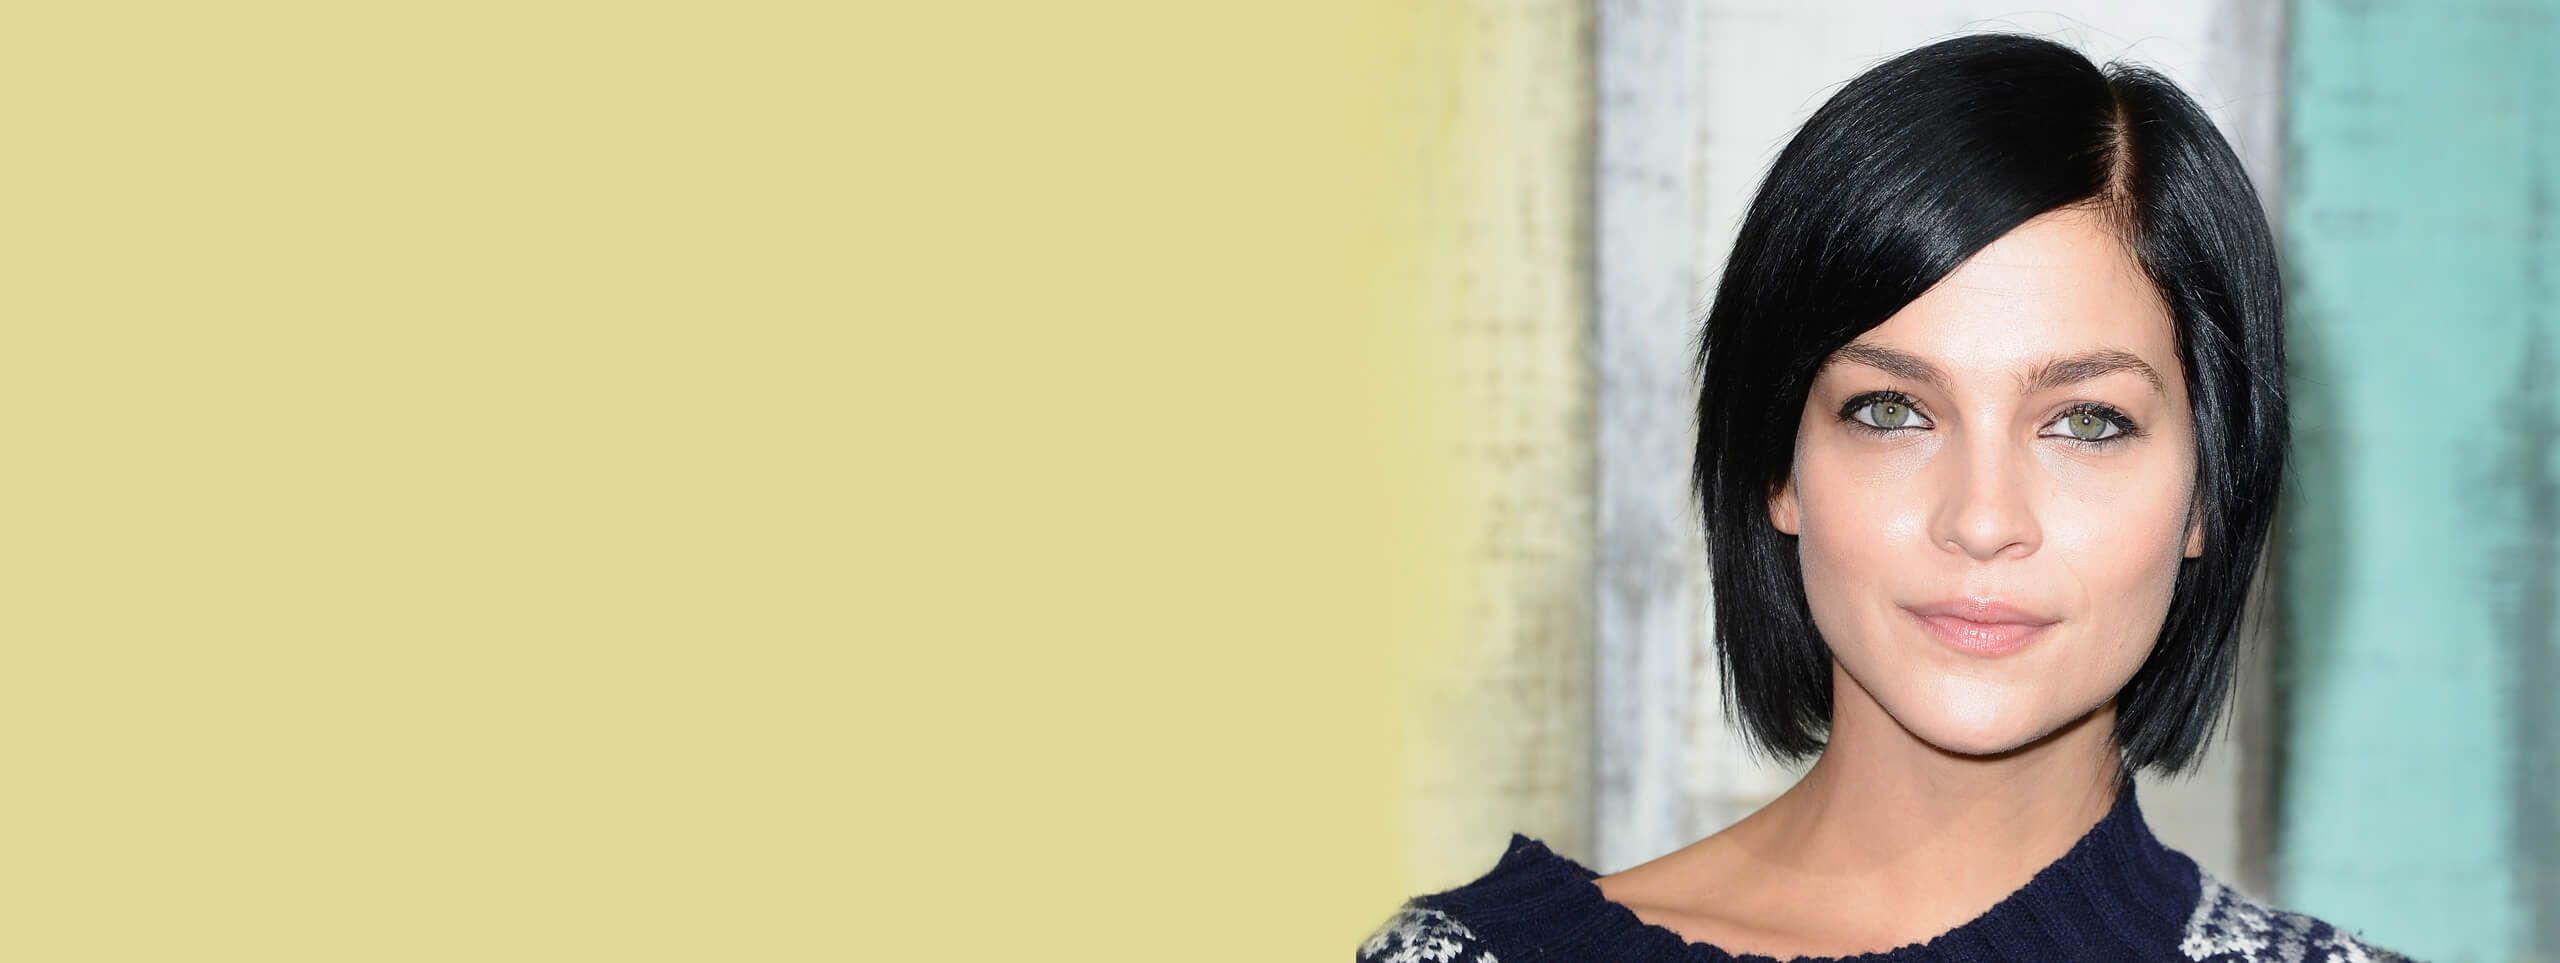 Woman rocks short black hairstyle